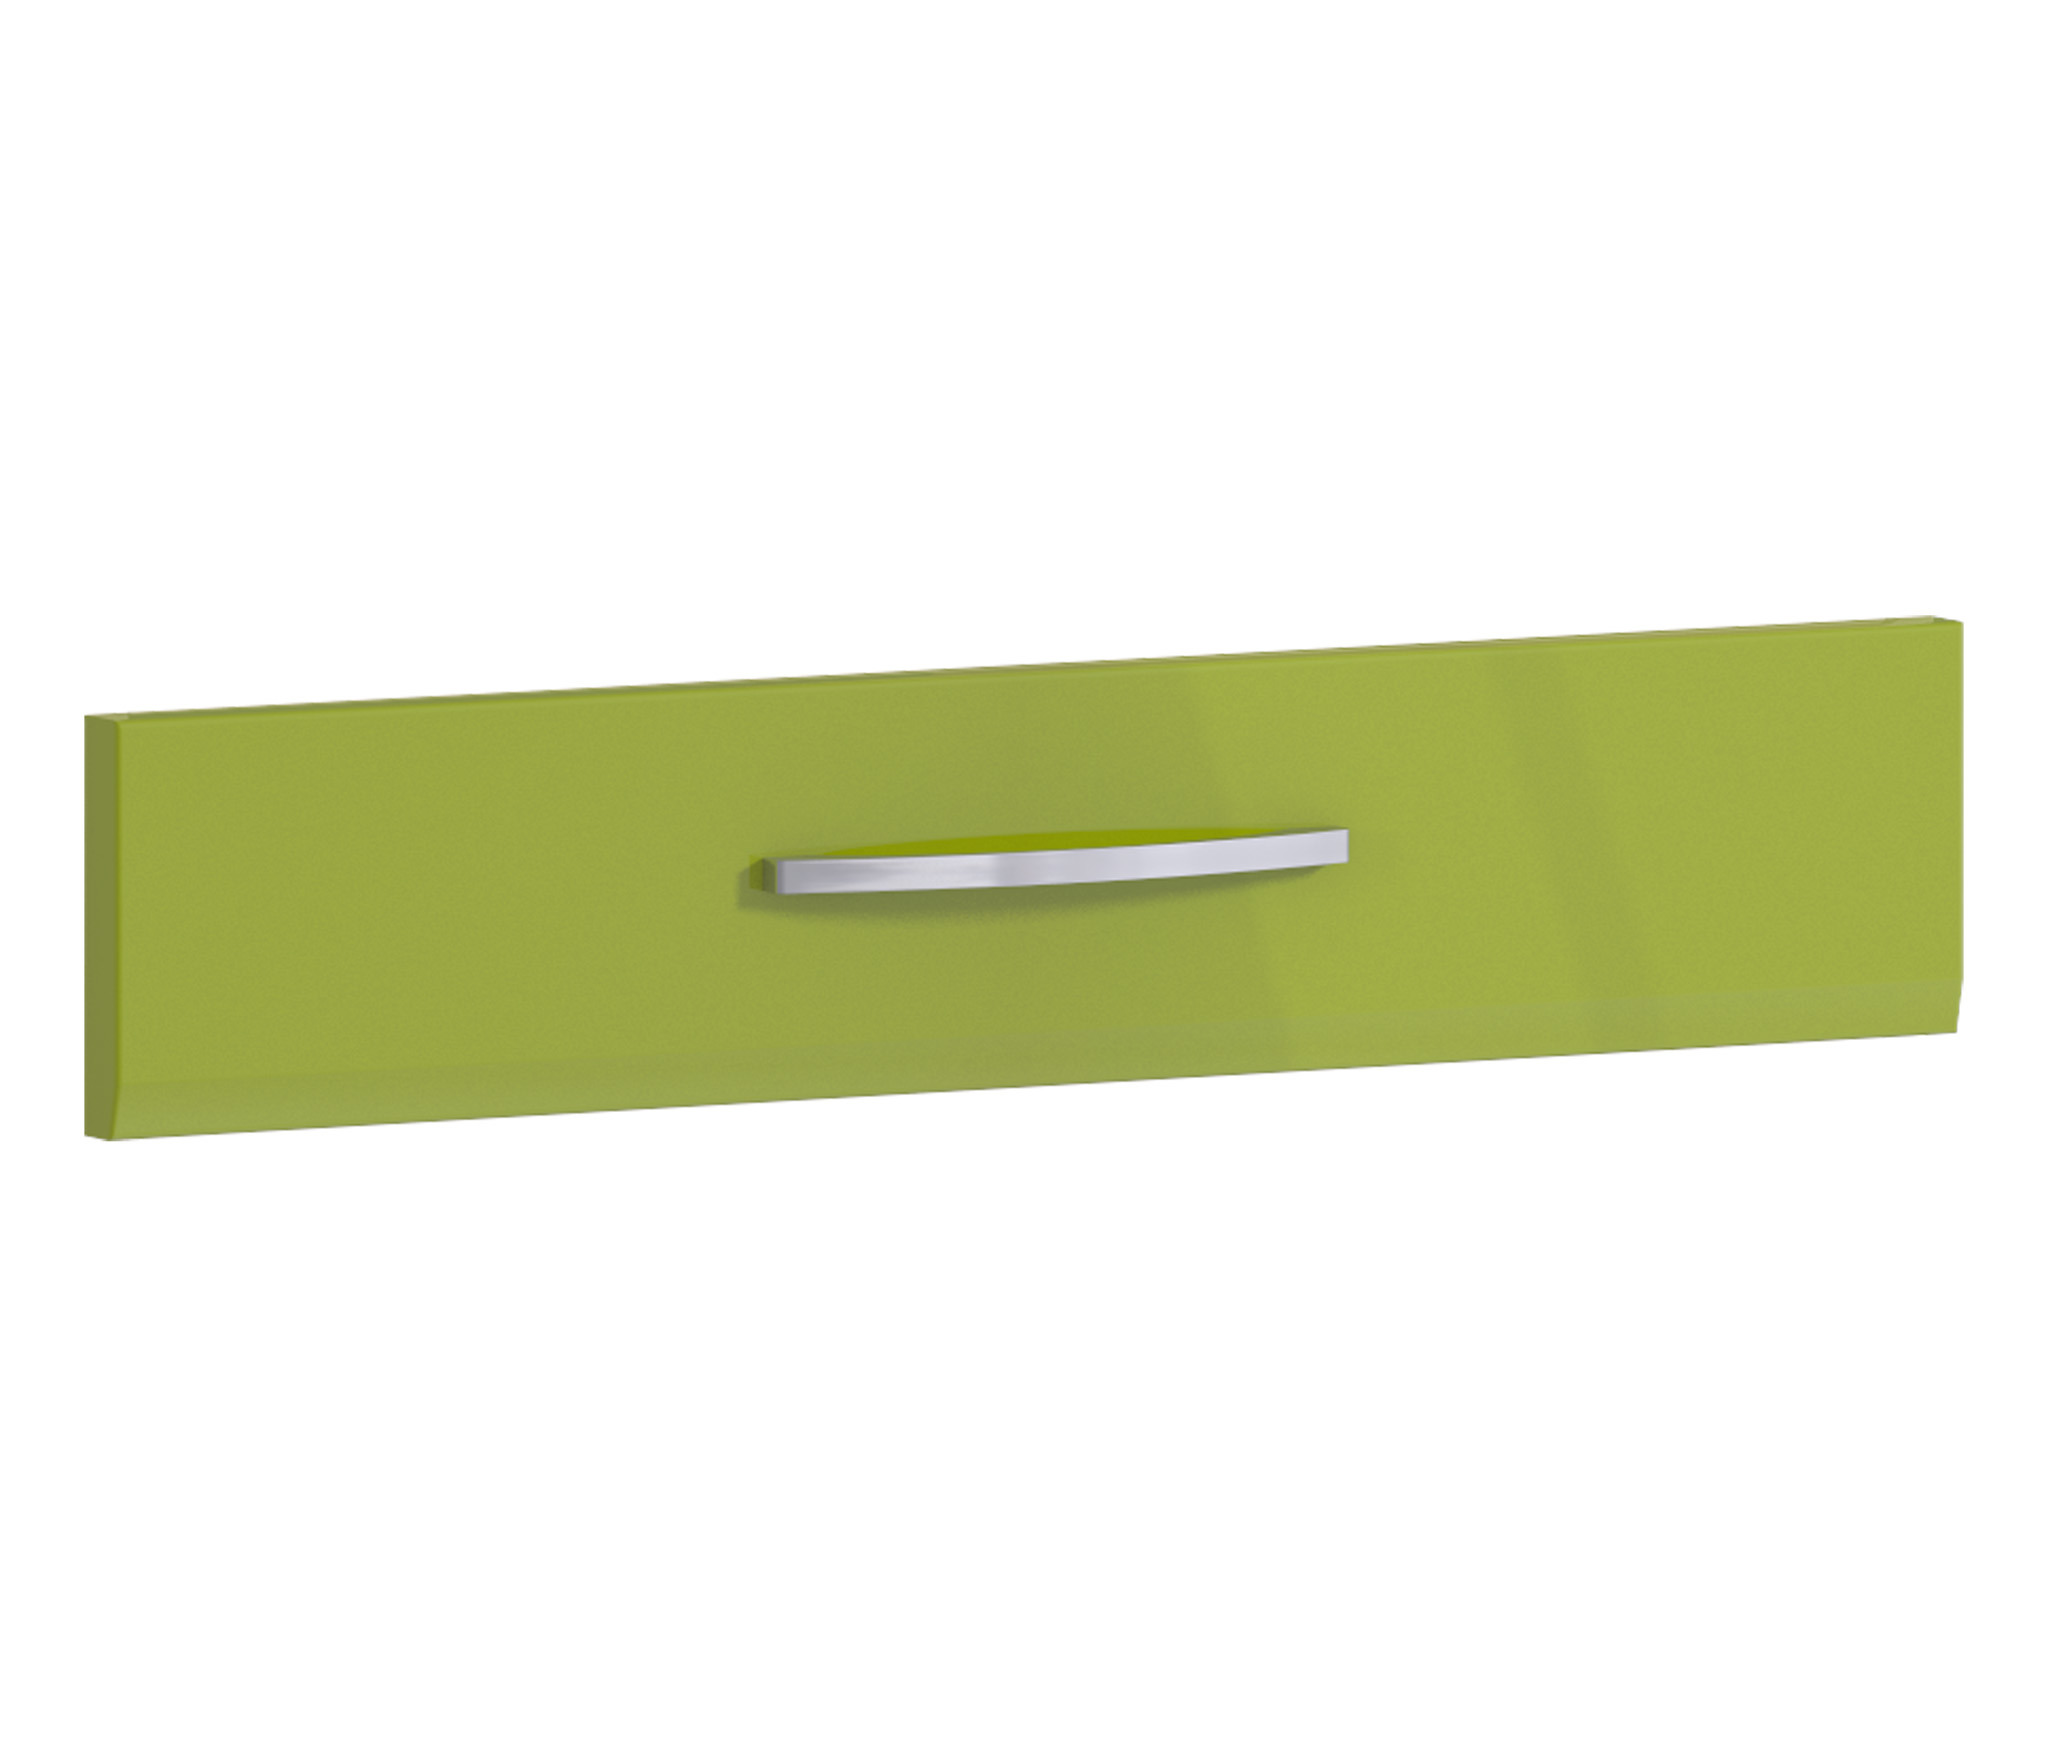 Фасад Регина ФД-1-60 к корпусу РСД-1-60Мебель для кухни<br>Фасад к корпусной мебели, который дополнит ваш кухонный гарнитур.<br><br>Длина мм: 596<br>Высота мм: 118<br>Глубина мм: 16